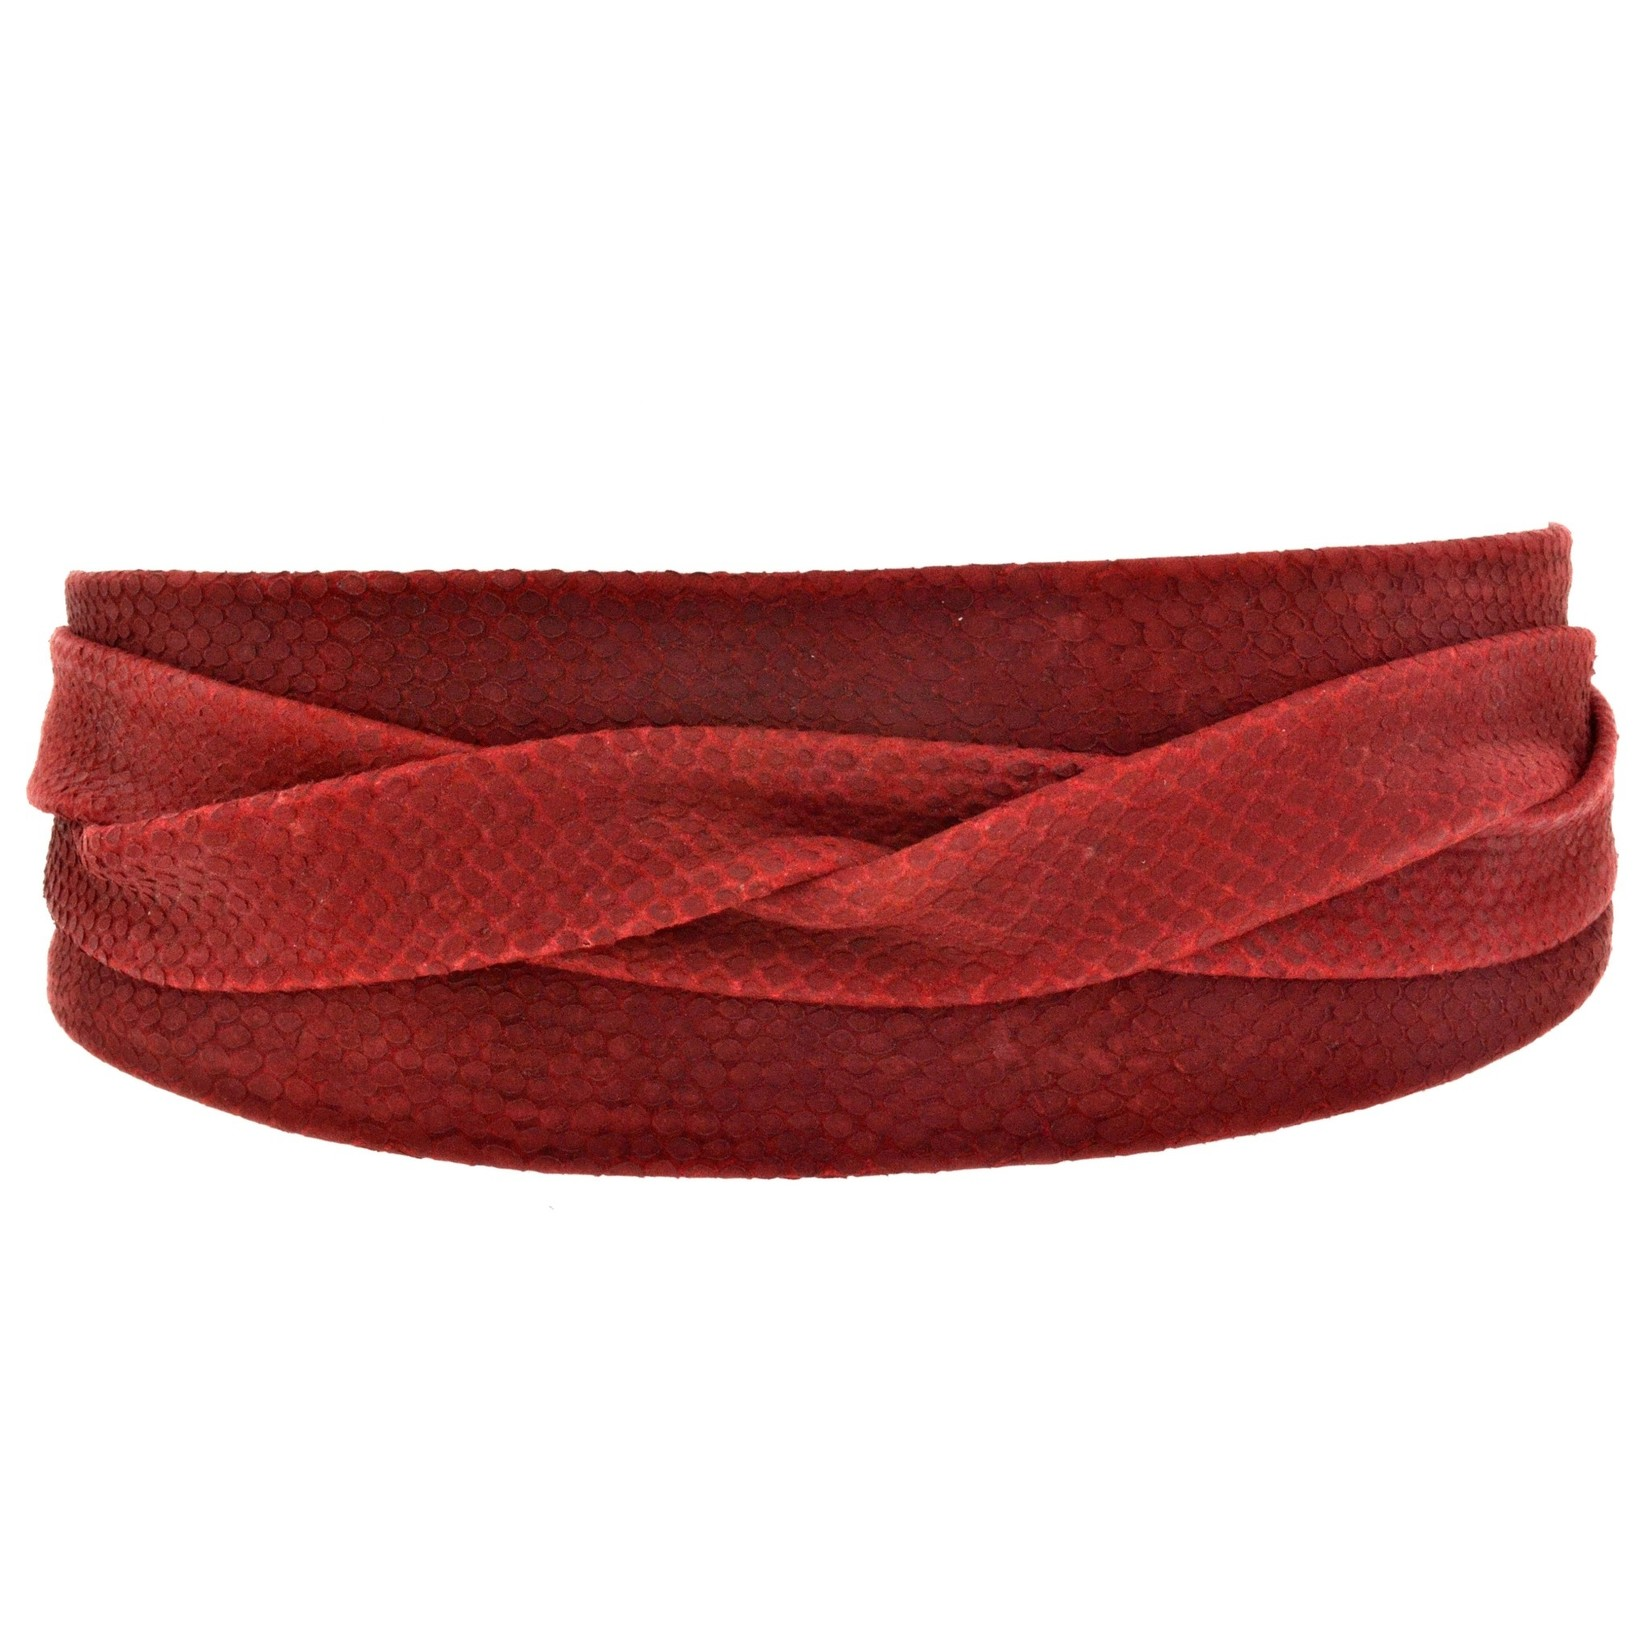 ADA Original Leather Wrap Belt in Scarlet Python